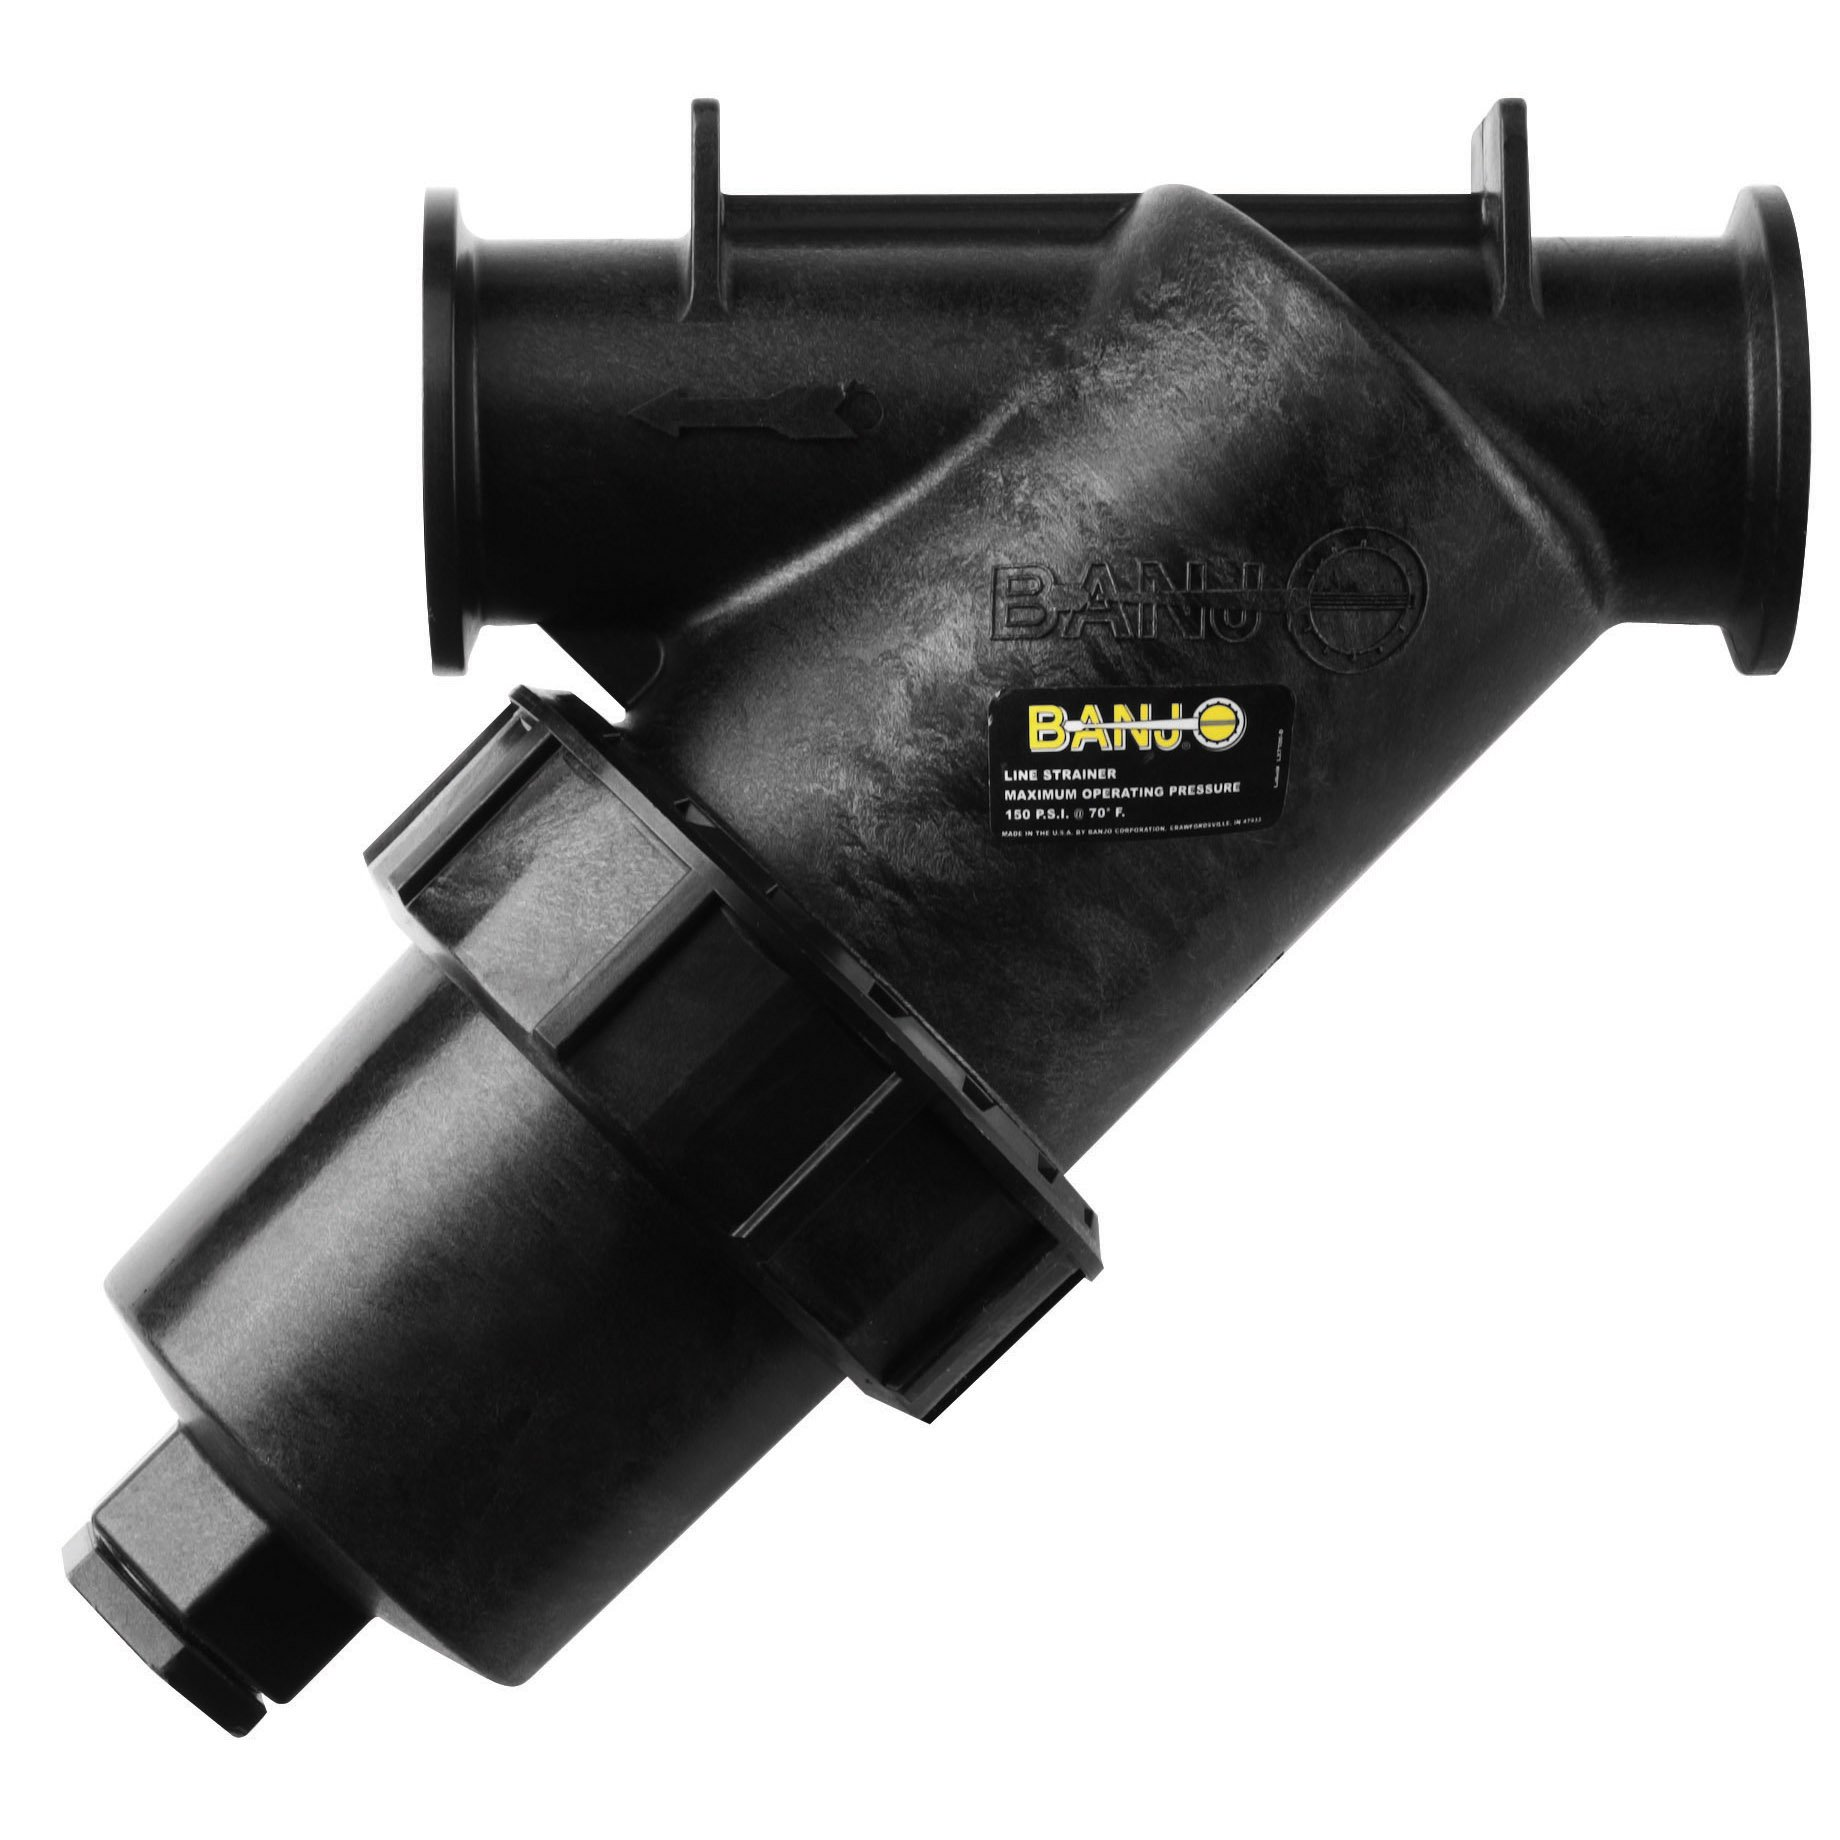 Banjo MLS222-50 2'' Full Port Manifold Y Strainer w/50 Mesh Screen